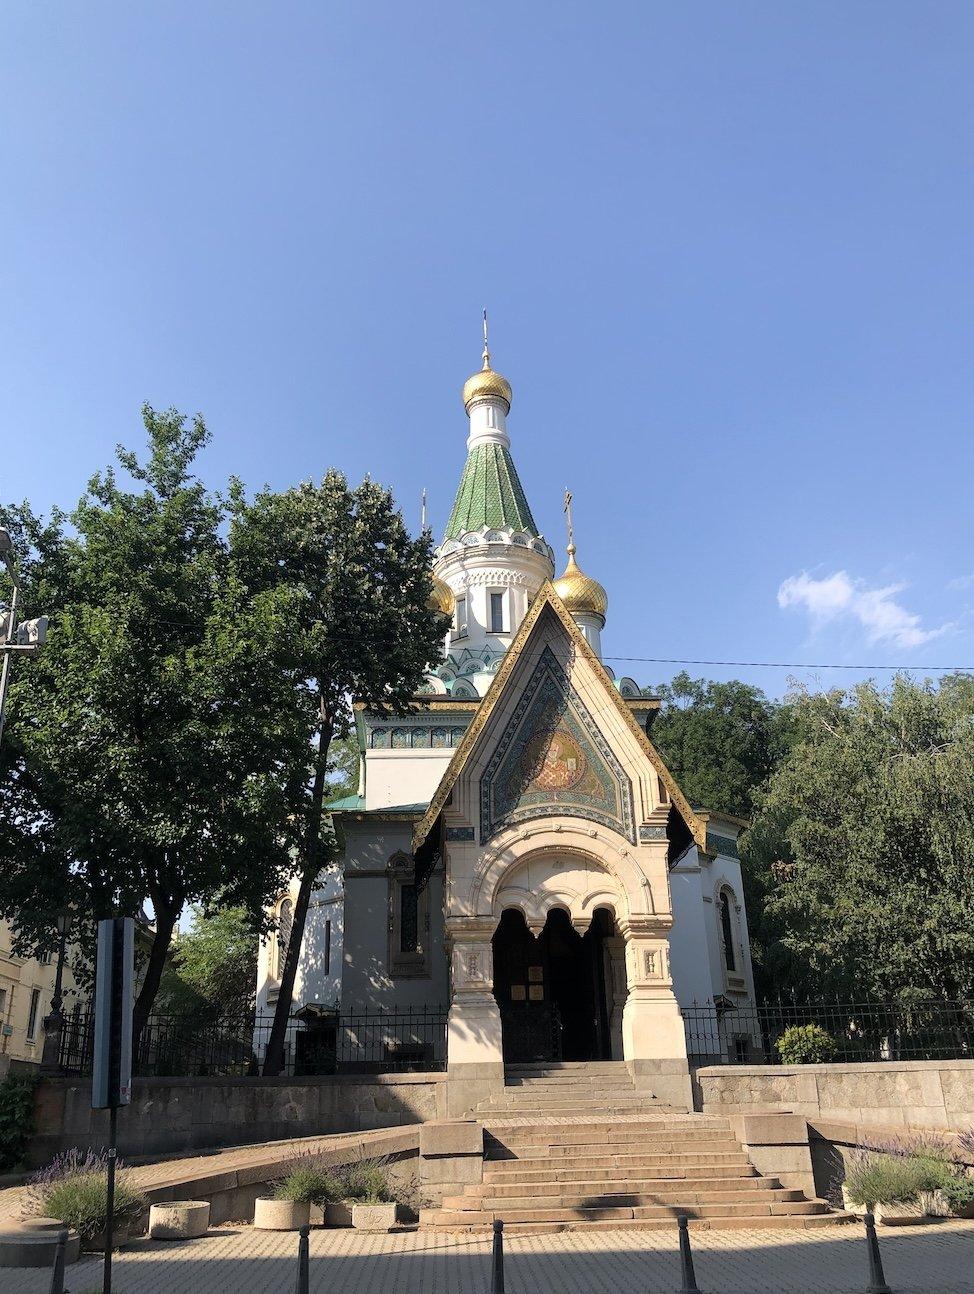 The Russian church in Sofia, Bulgaria.